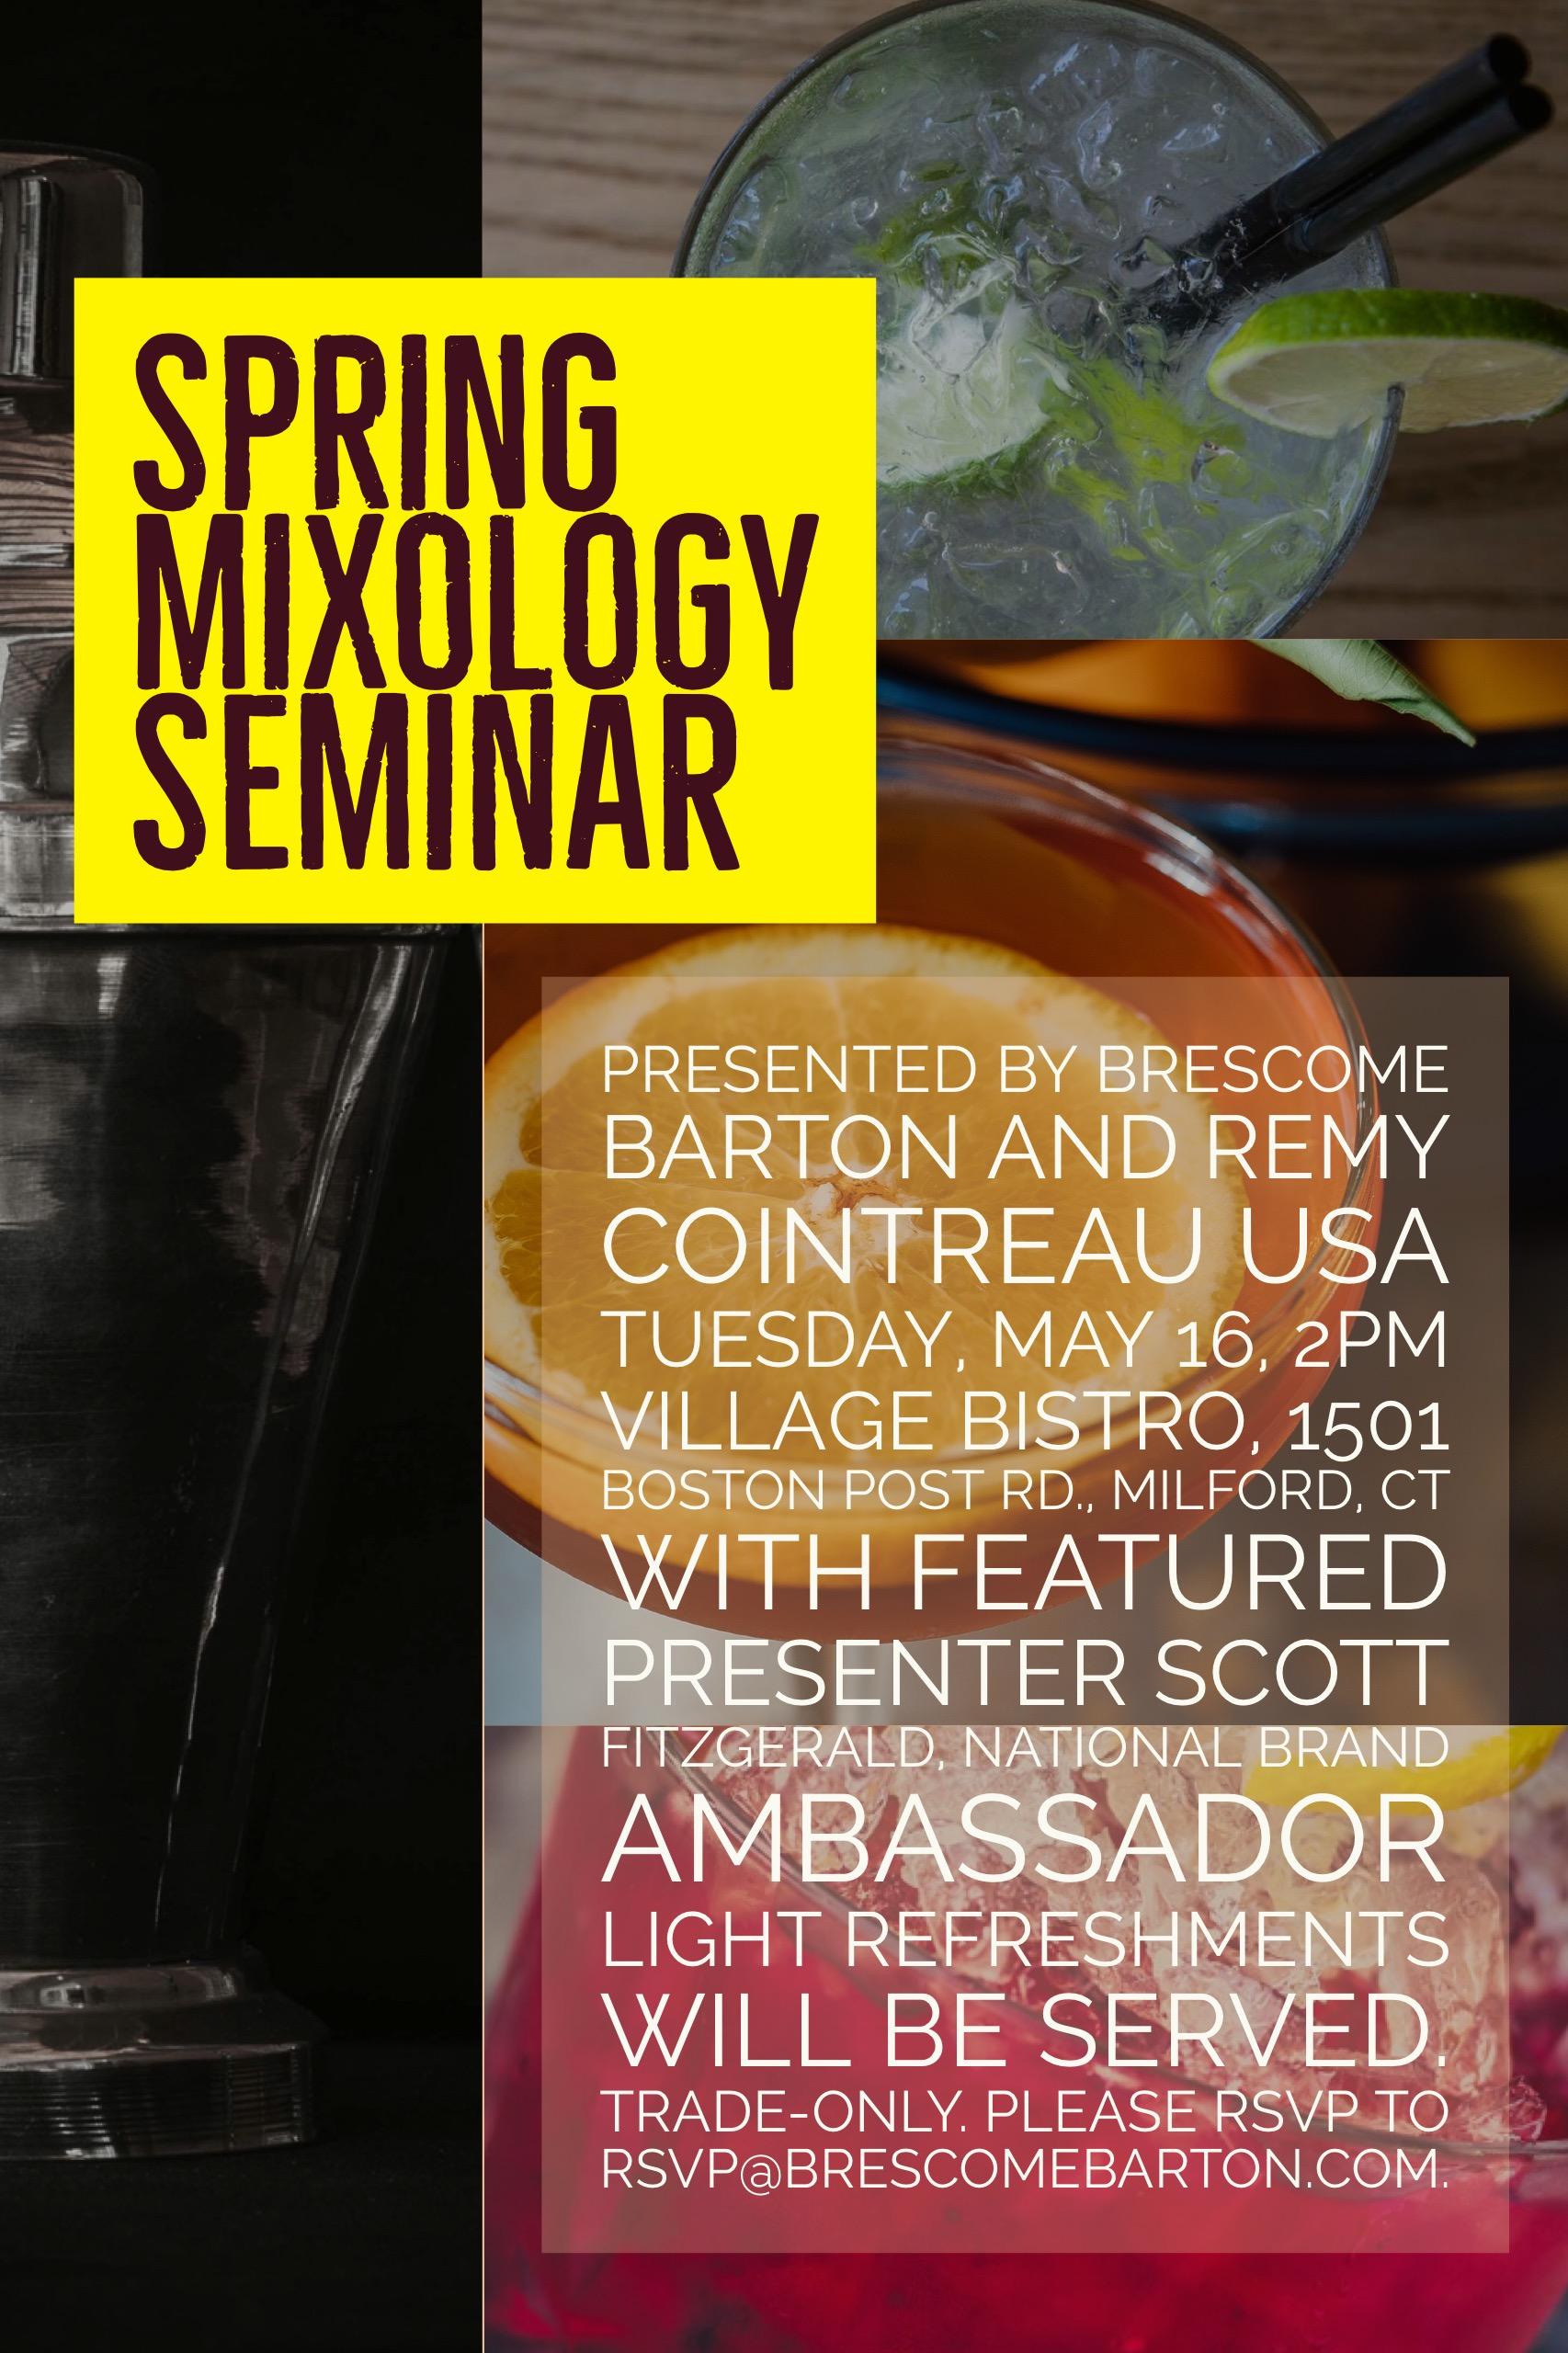 May 16, 2017: (Trade Only) Brescome Barton, Remy Cointreau Brand Seminar